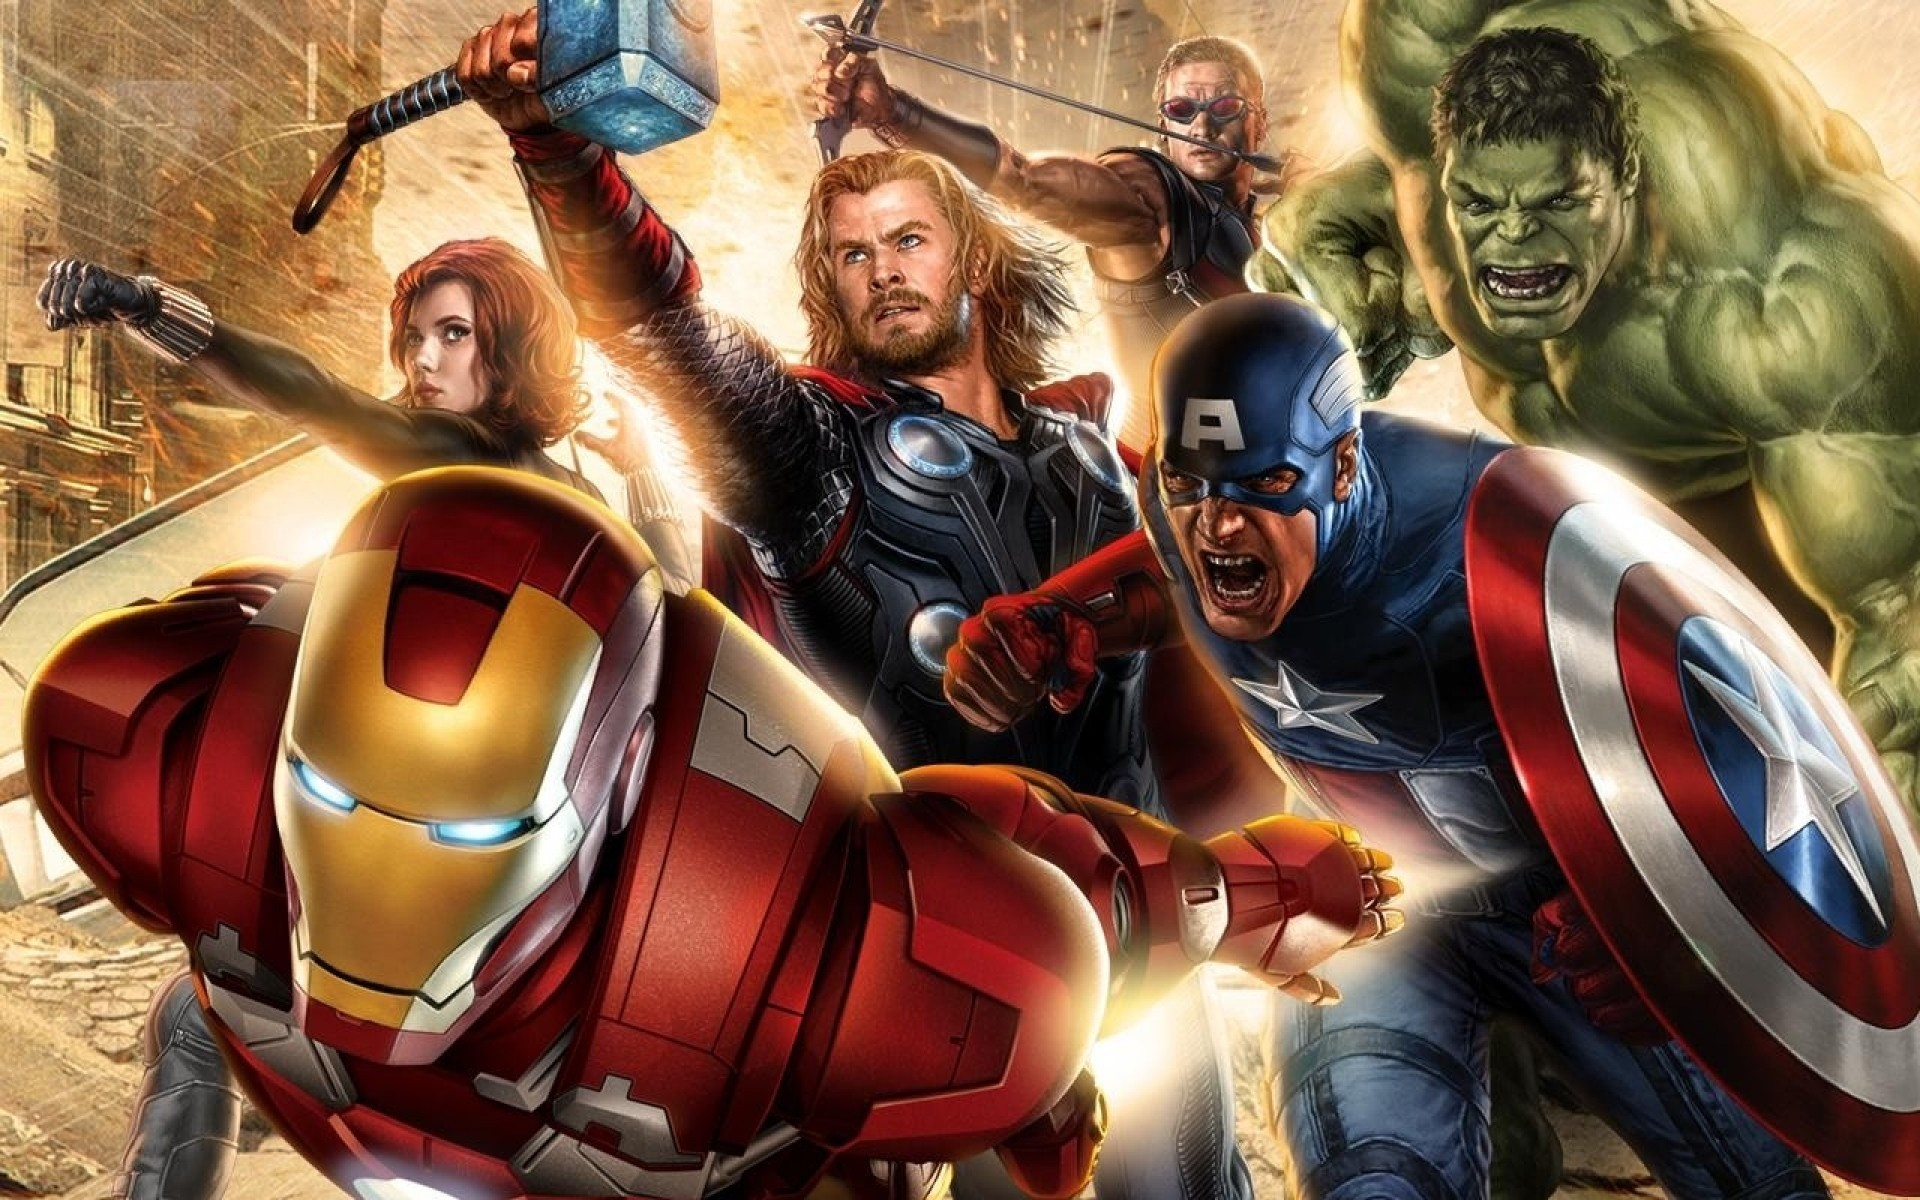 День, картинки марвел супергерои крутые